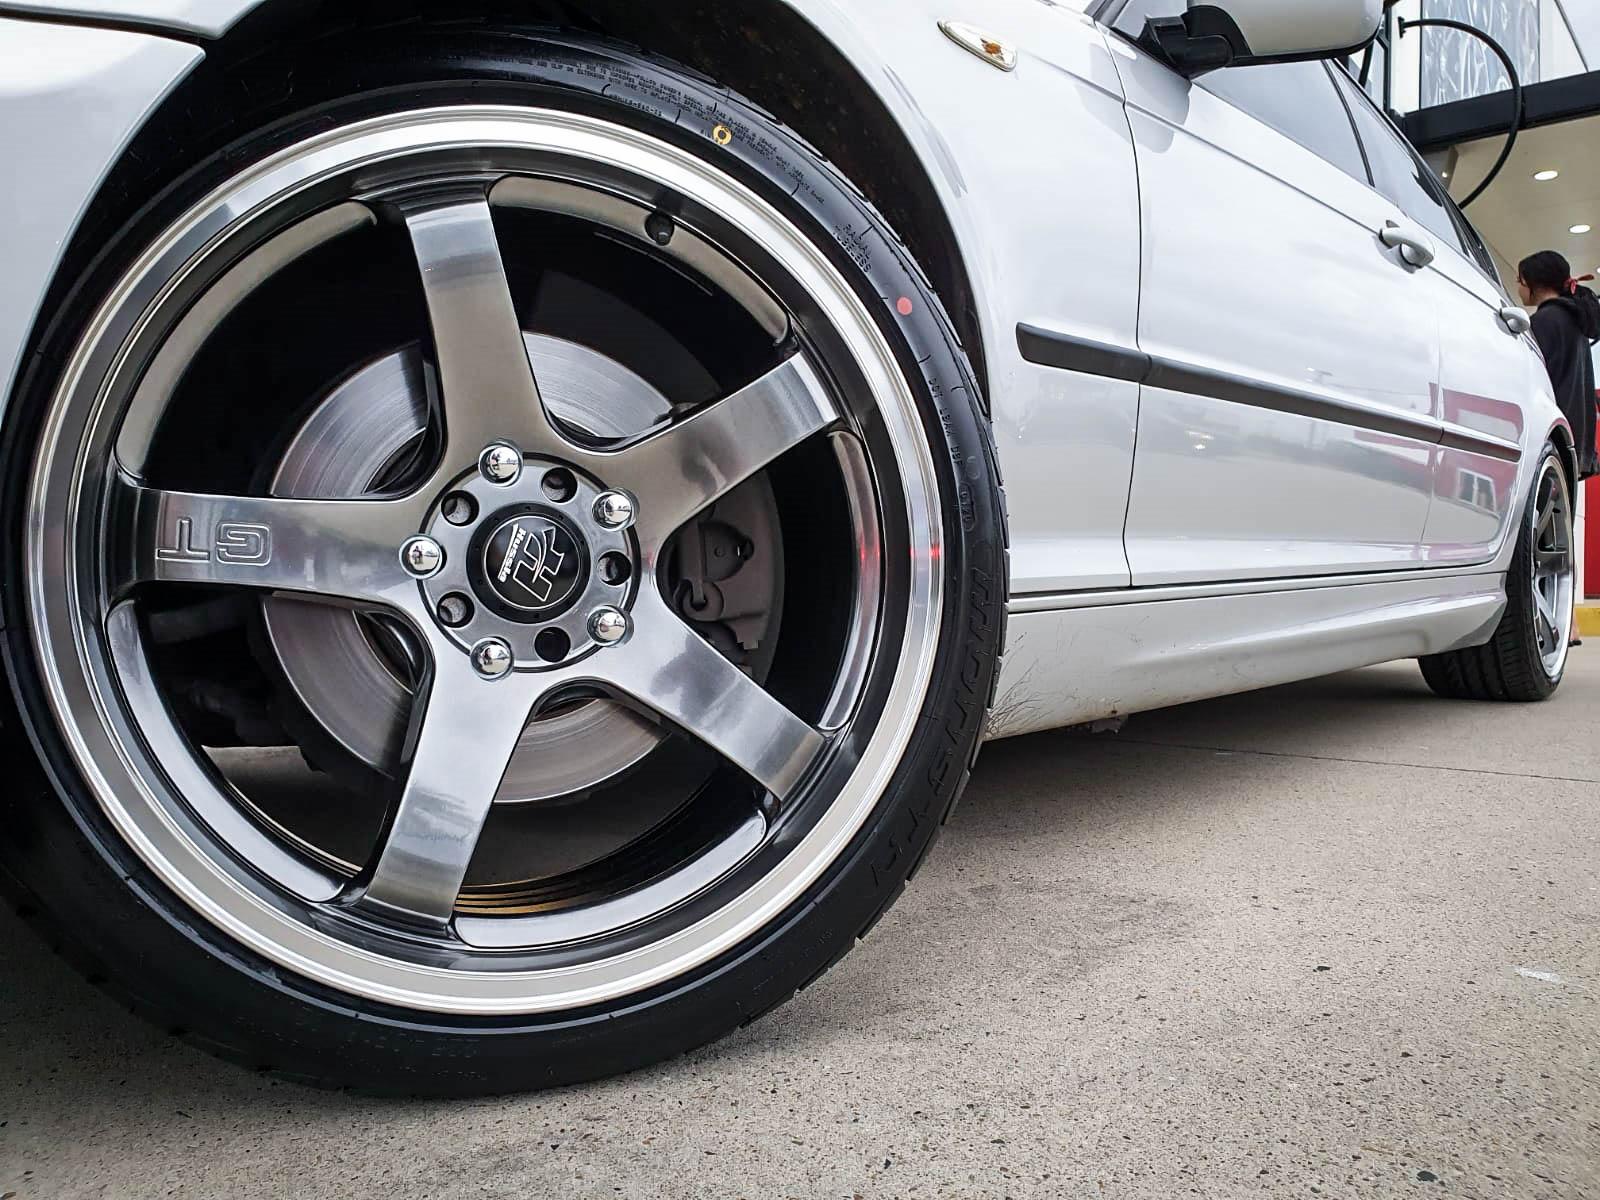 BMW 325i on hussla GT chromium 1 of 4